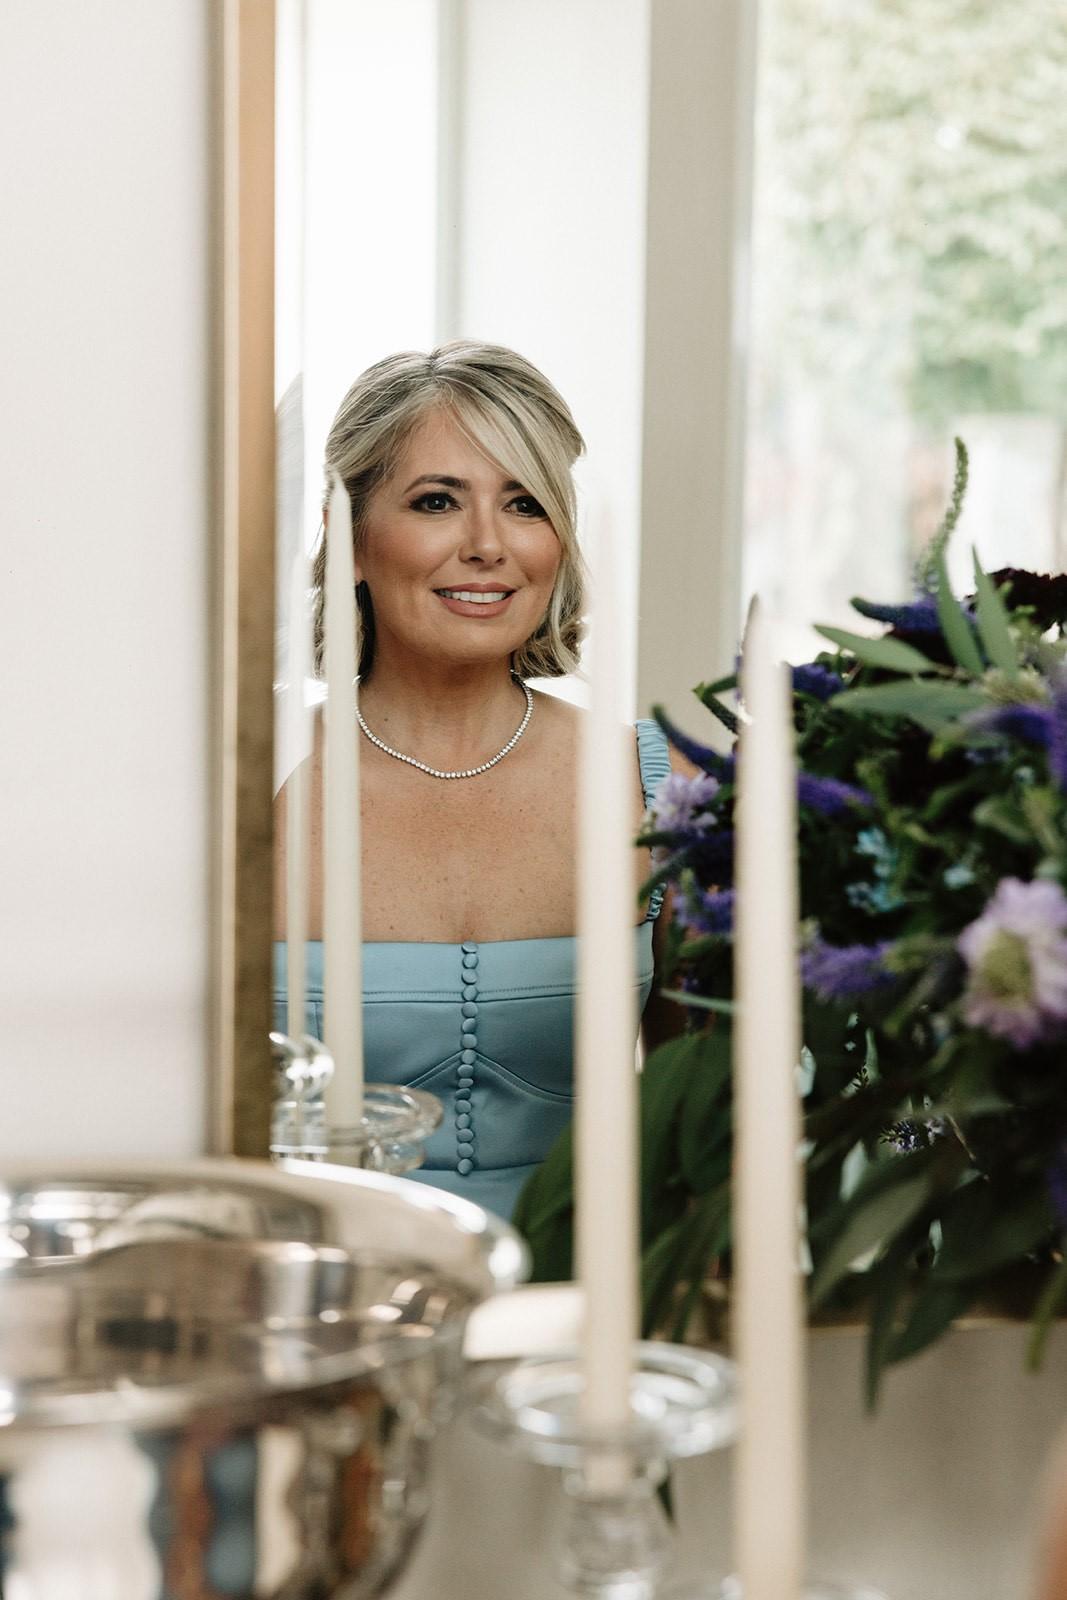 Arreglo de la novia: Ingrid Rivera (Phosphilic)